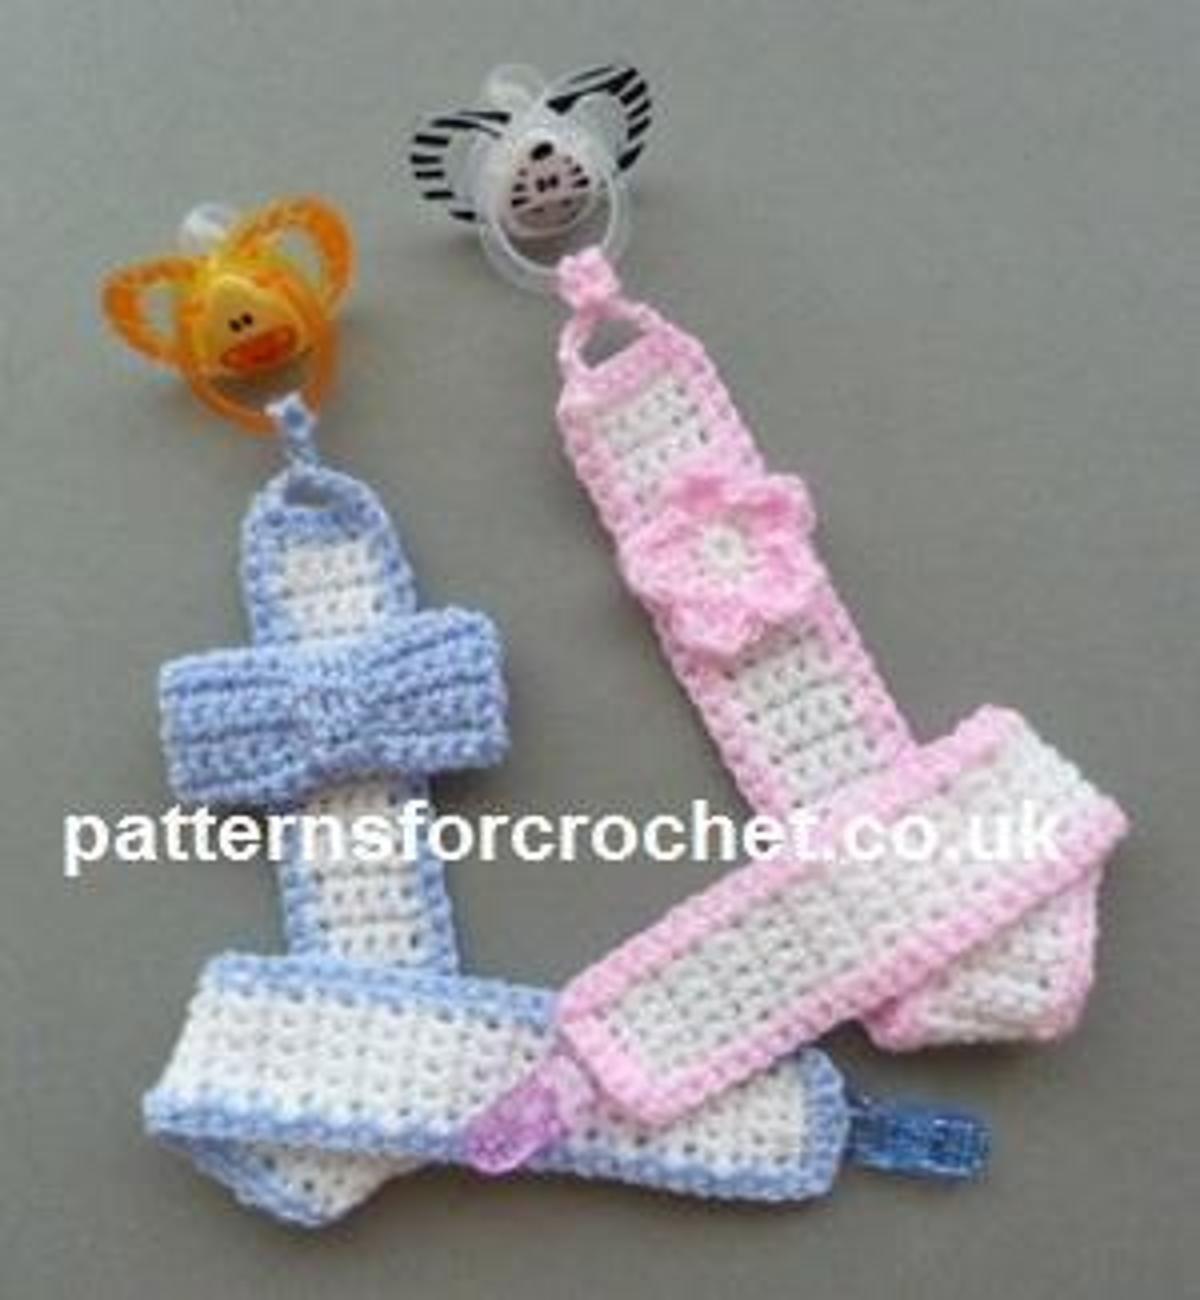 pfc226-Pacifier baby crochet pattern | Craftsy | baby | Pinterest